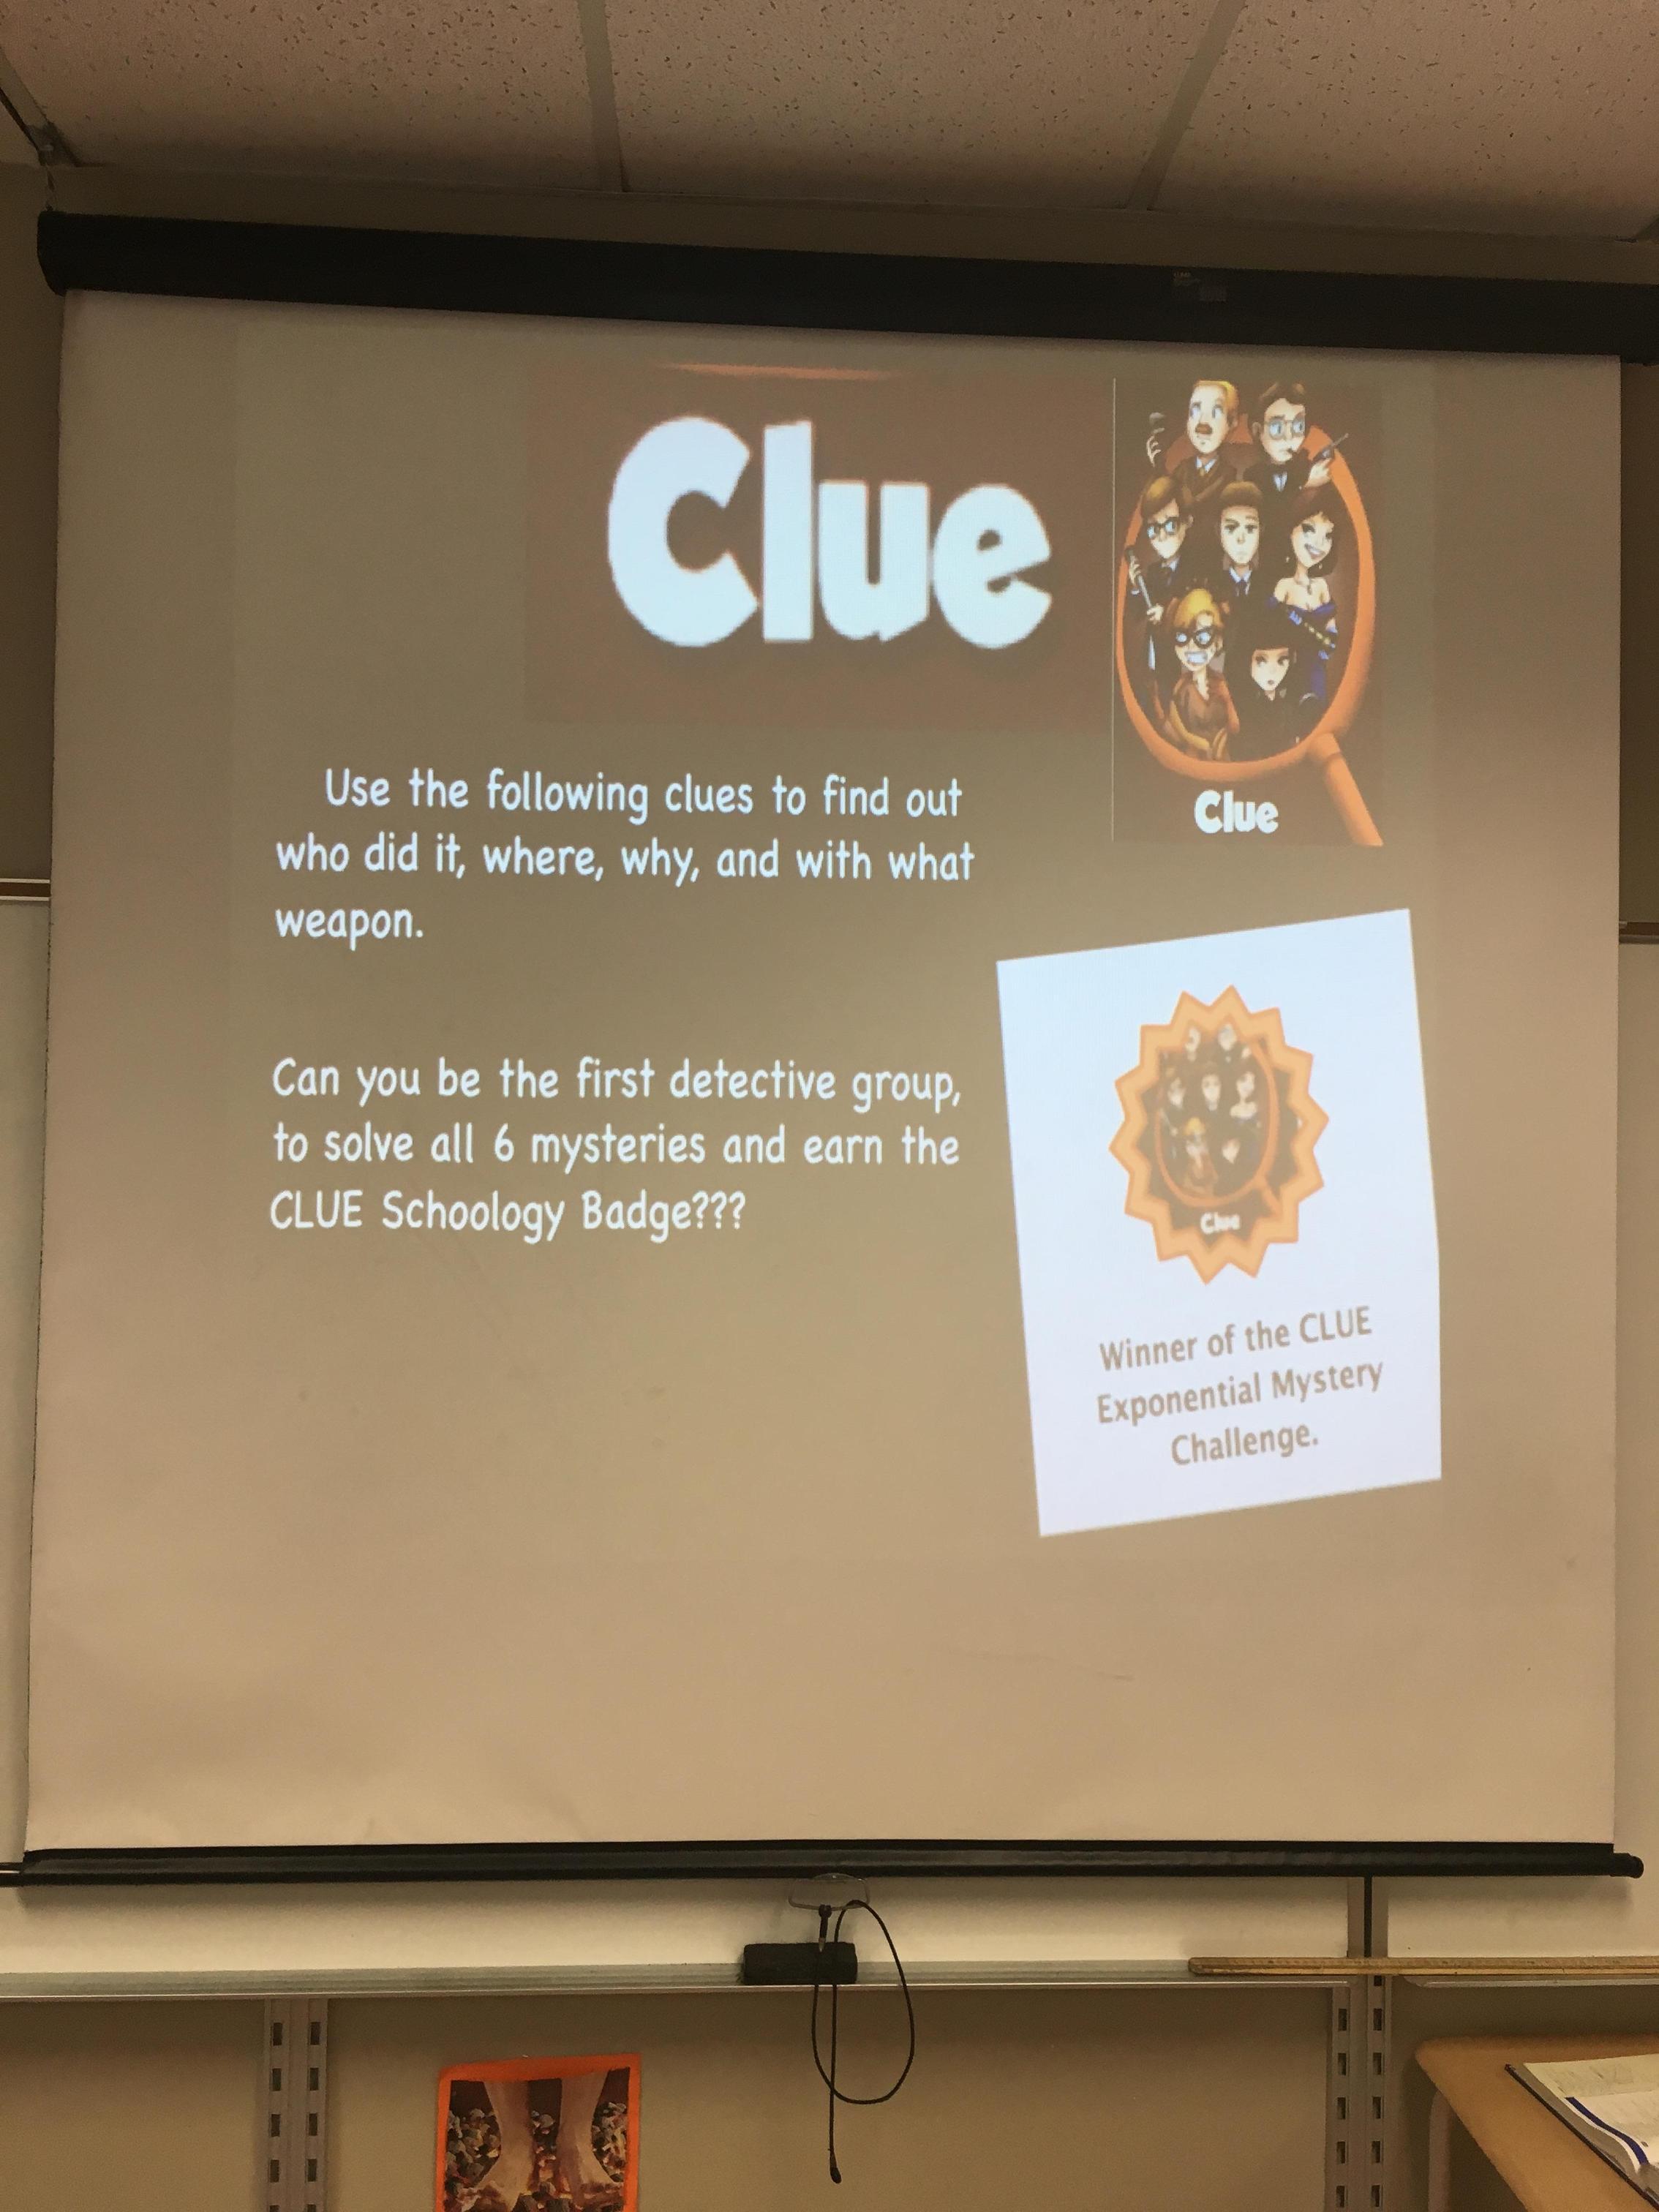 Clue review